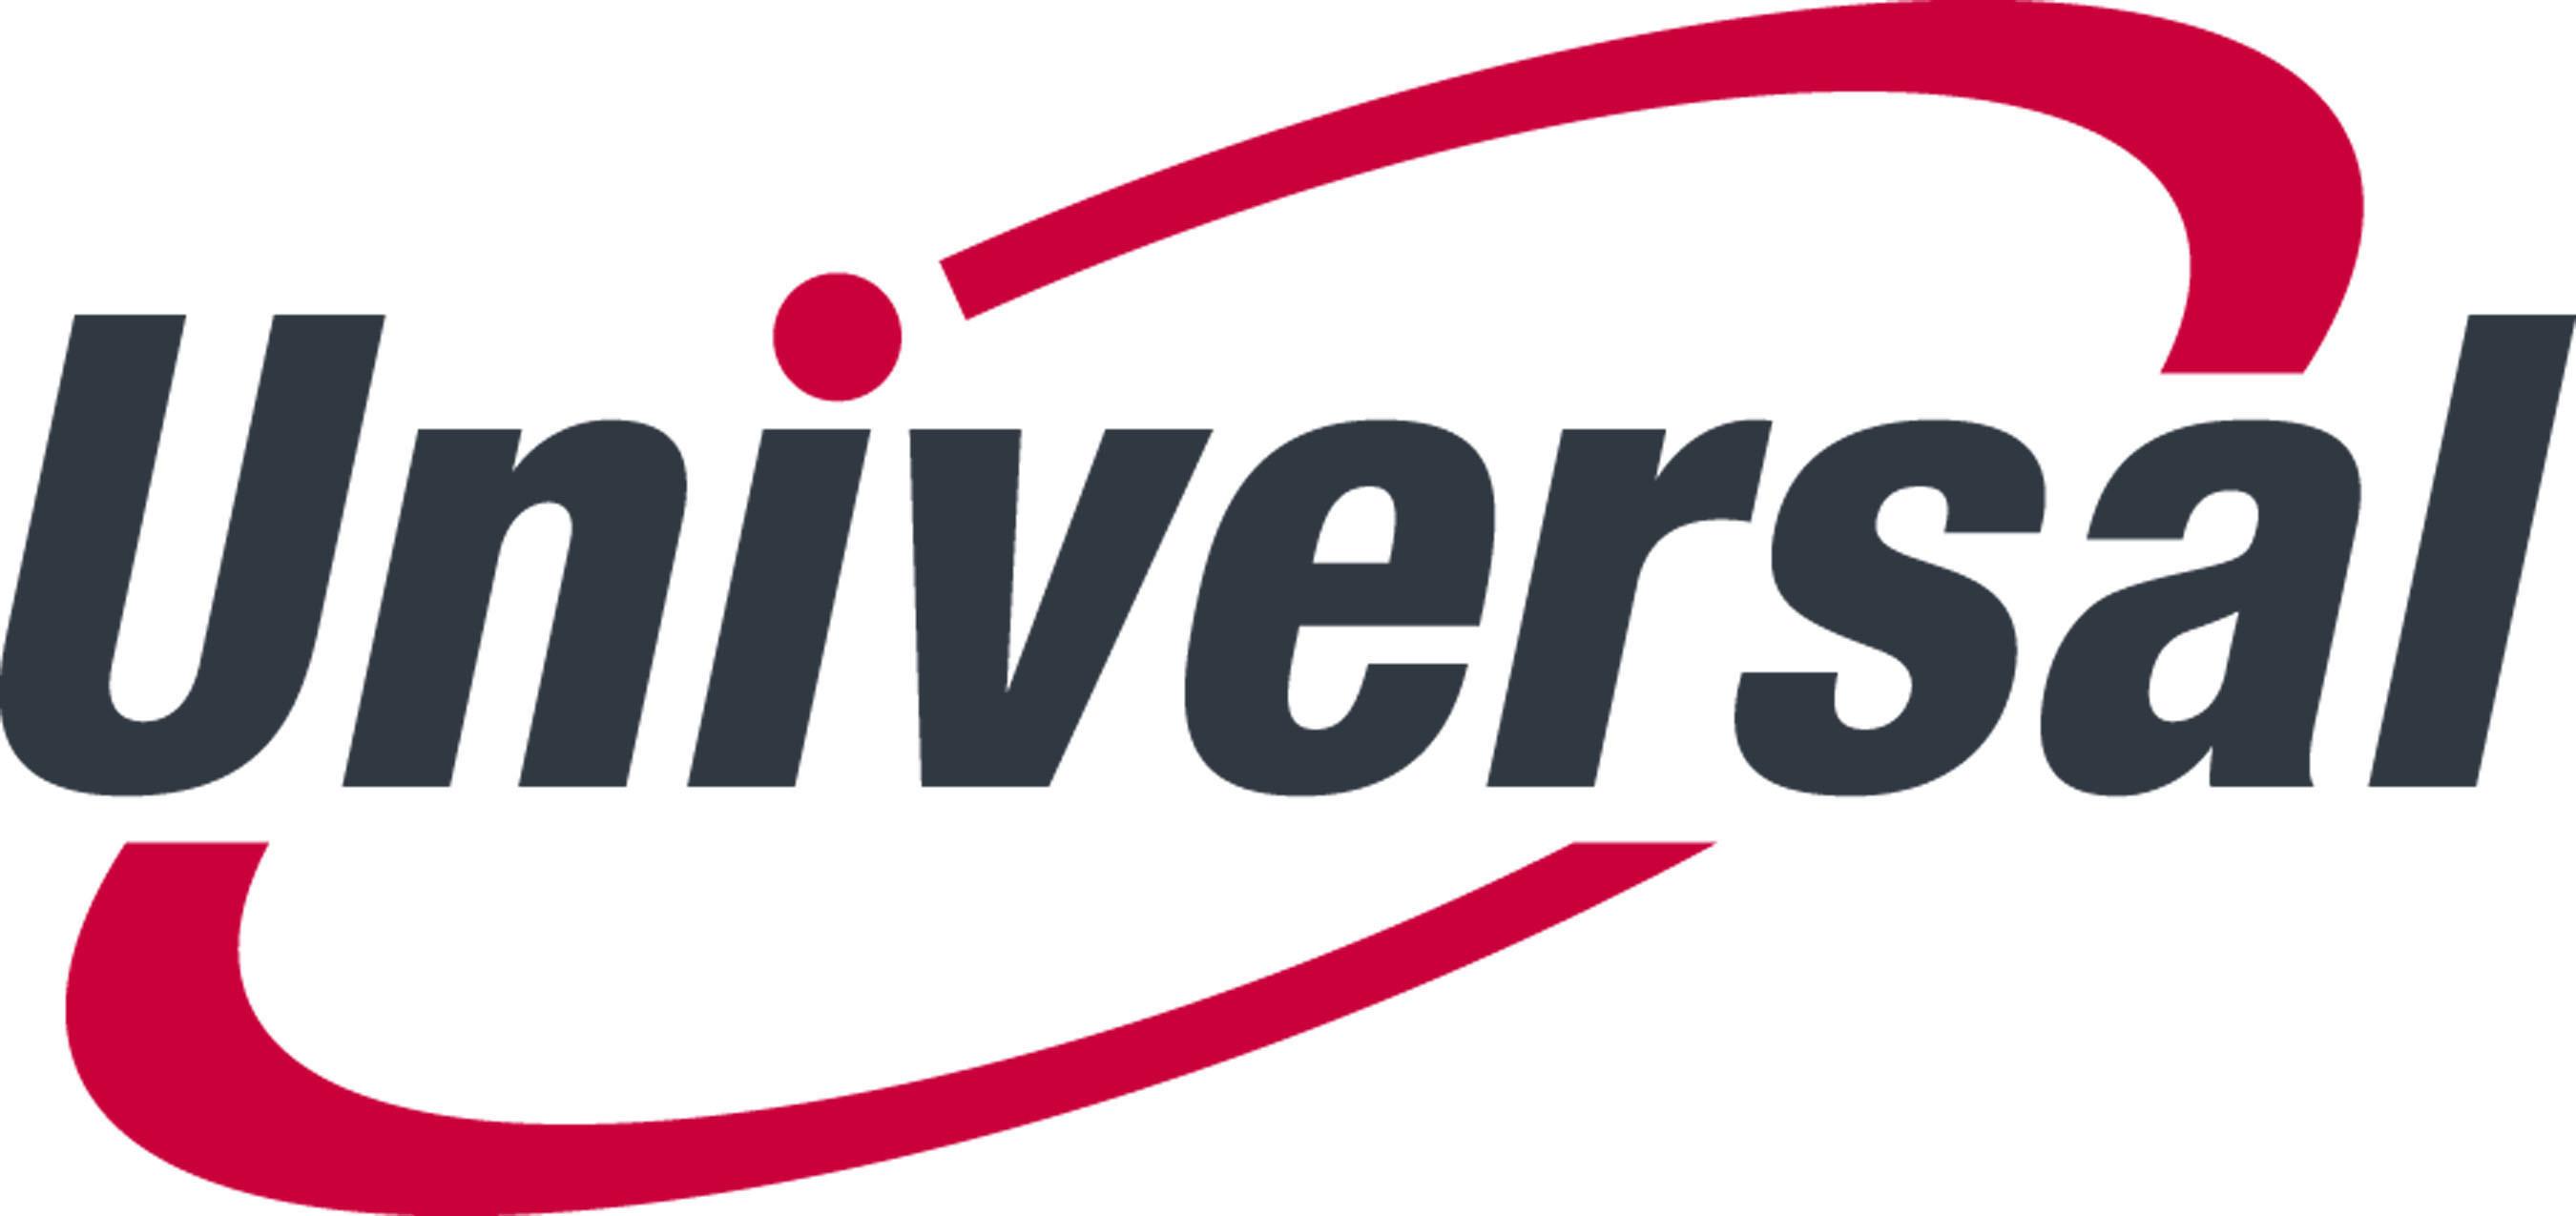 Universal Logistics Holdings logo